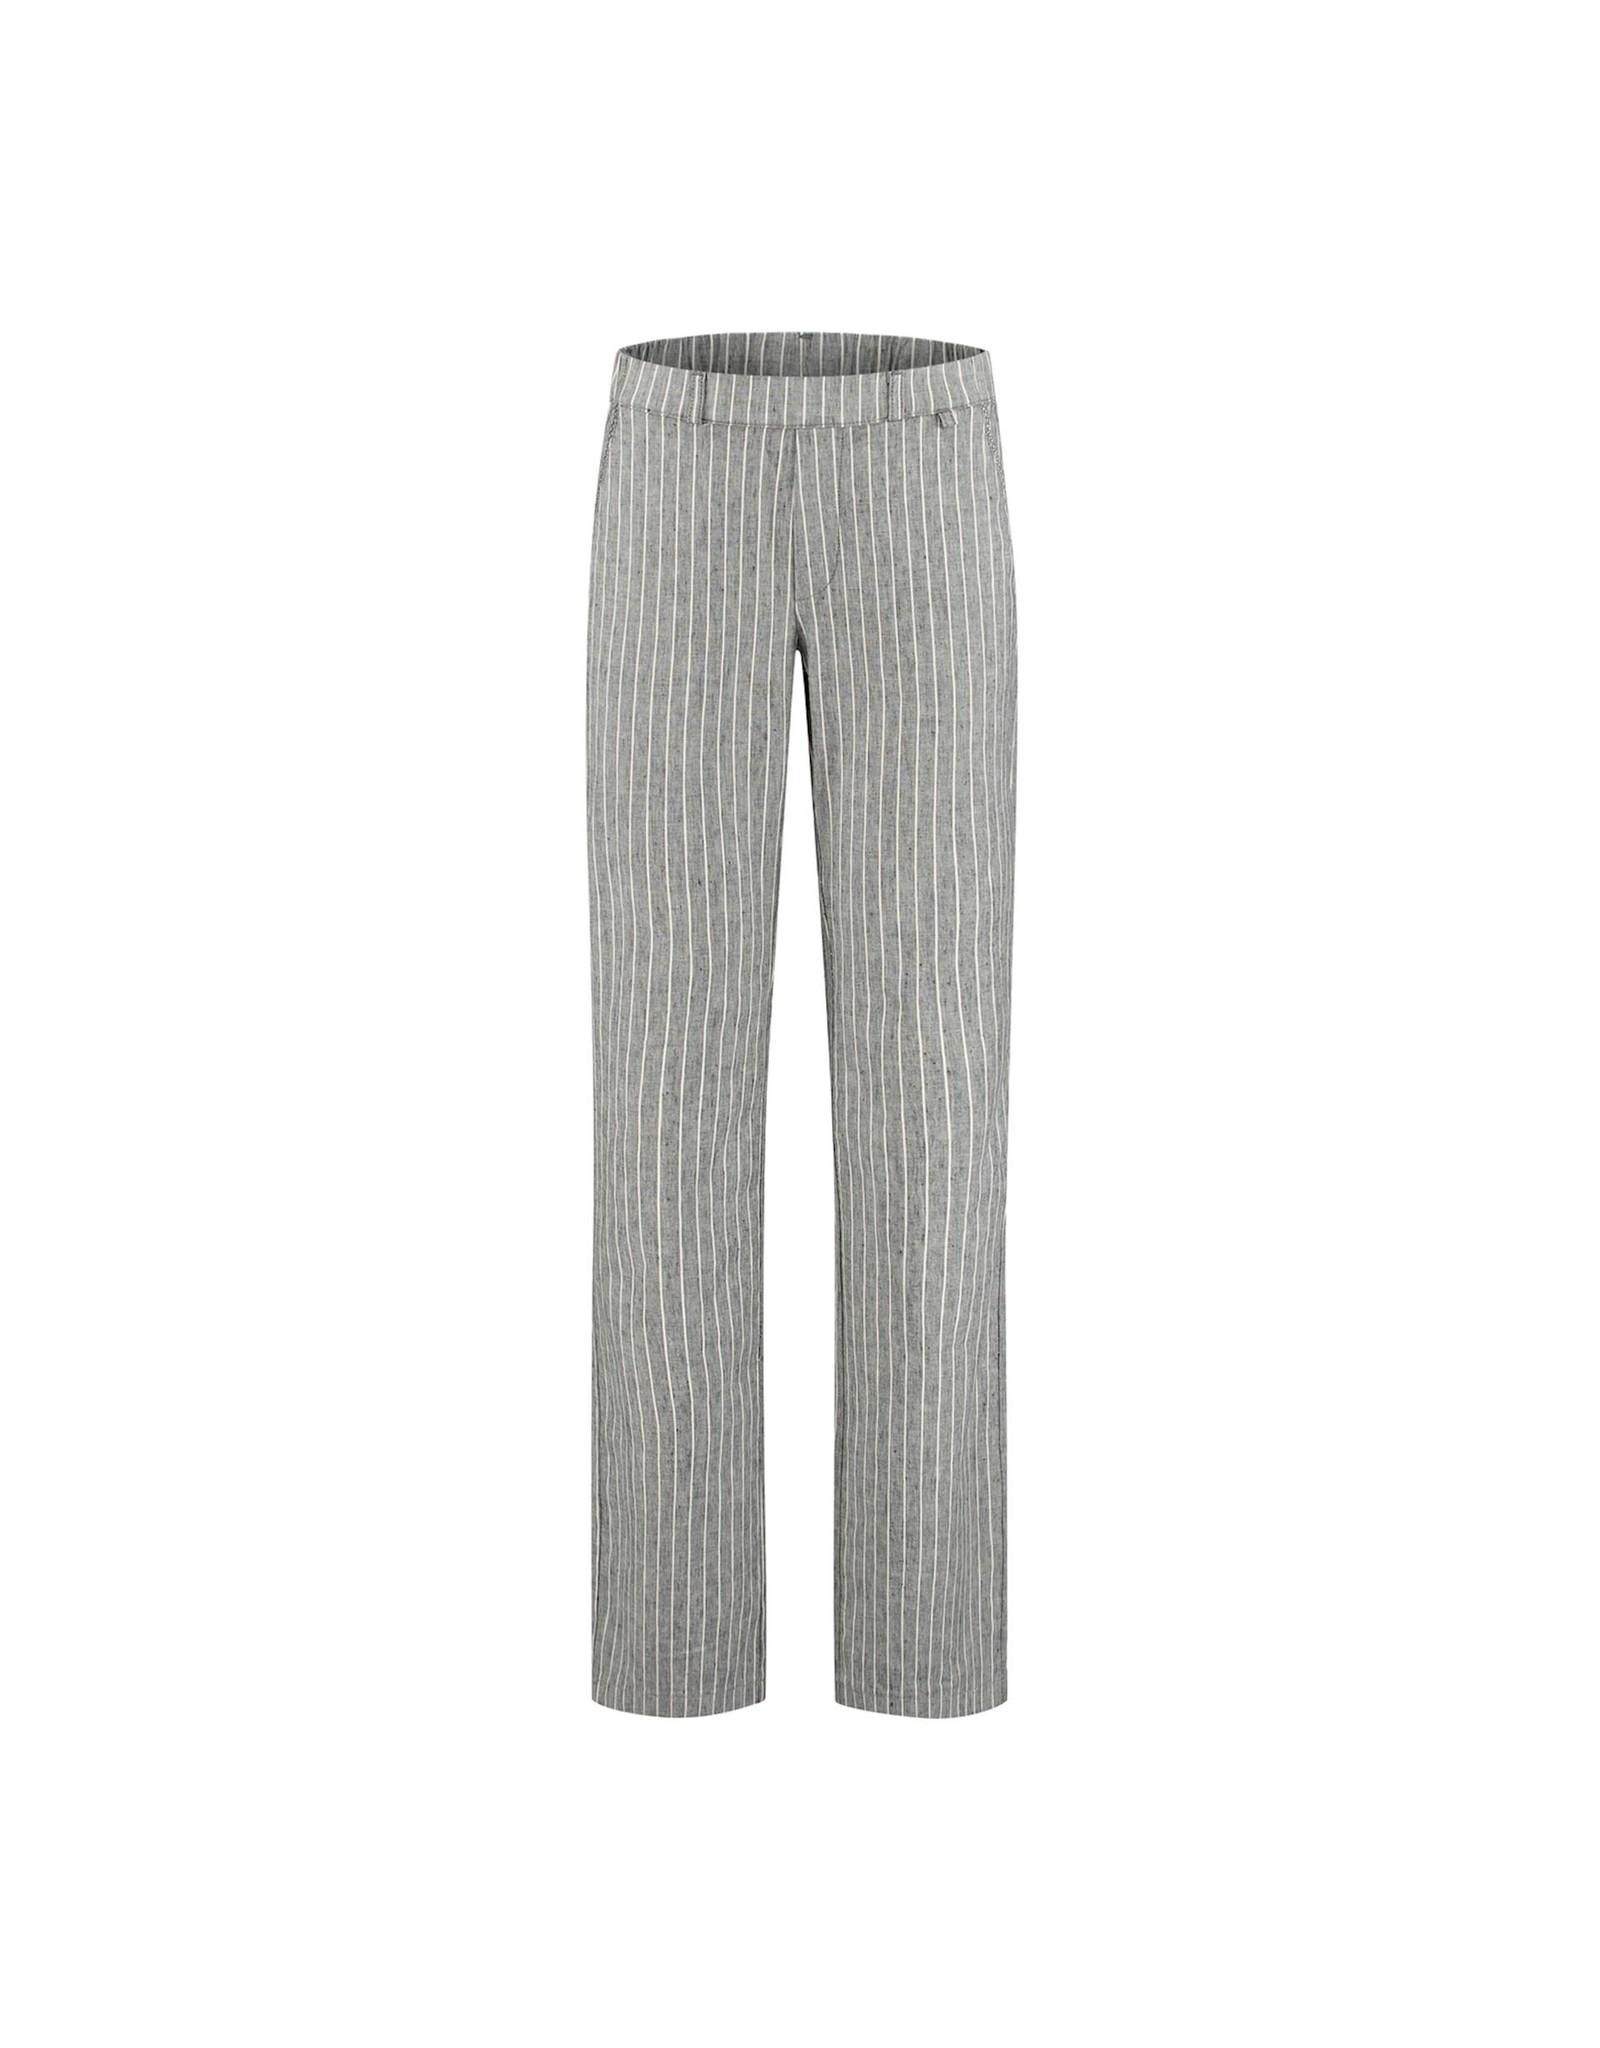 Para Mi Hannah / Stripy Linen  SS212.141018